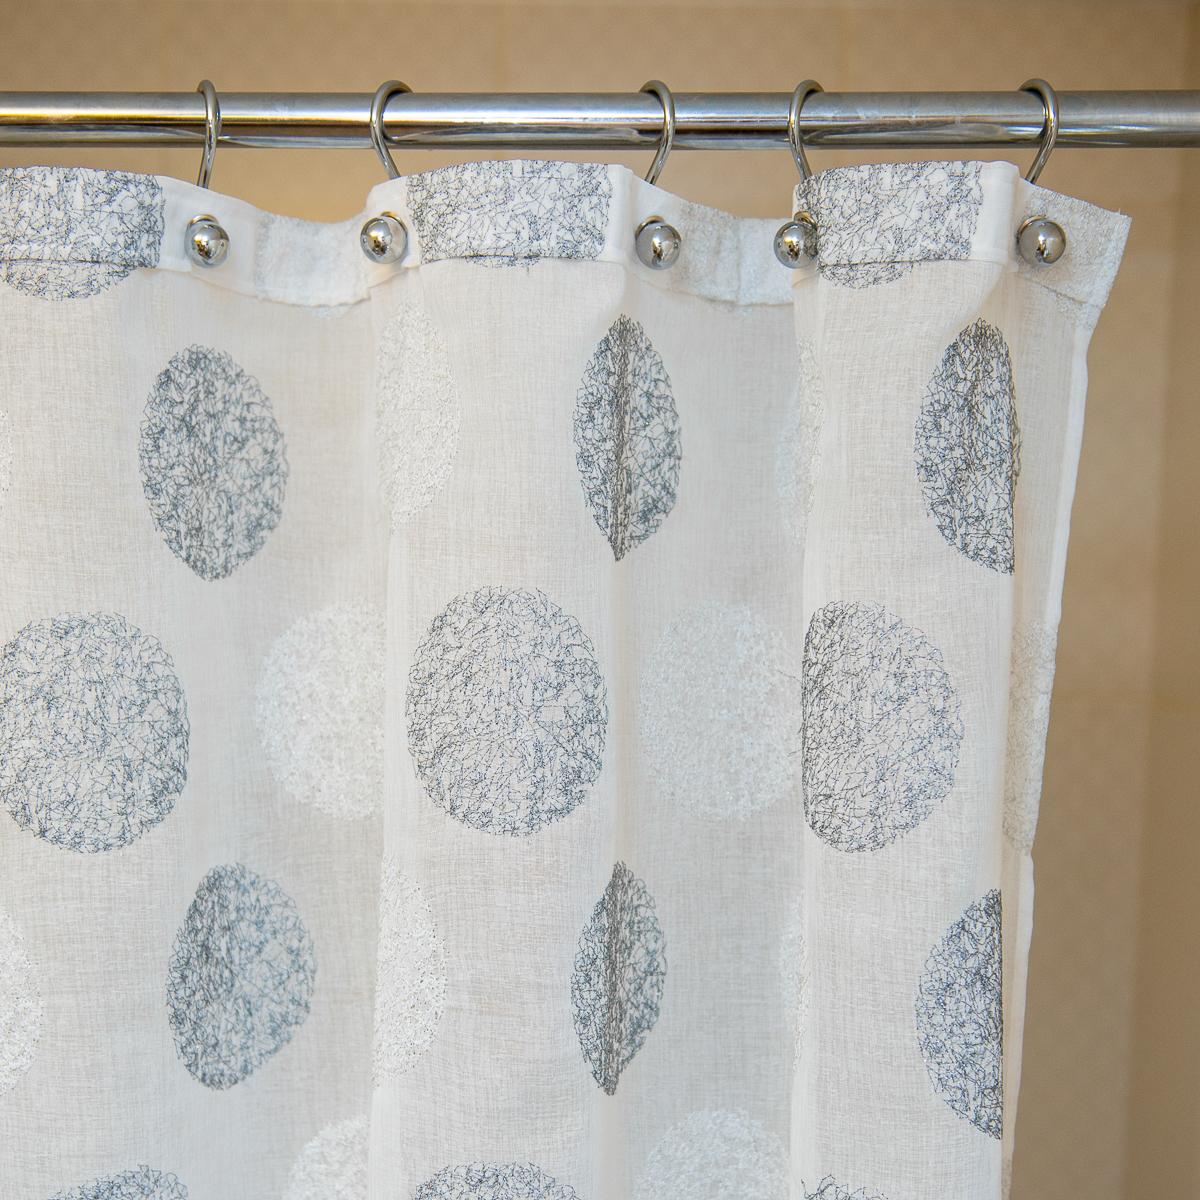 Шторки для ванной Шторка для ванной 180x200 Arti-Deco Aviles Grey elitnaya-shtorka-dlya-vannoy-aviles-grey-ot-arti-deco-ispaniya.jpg